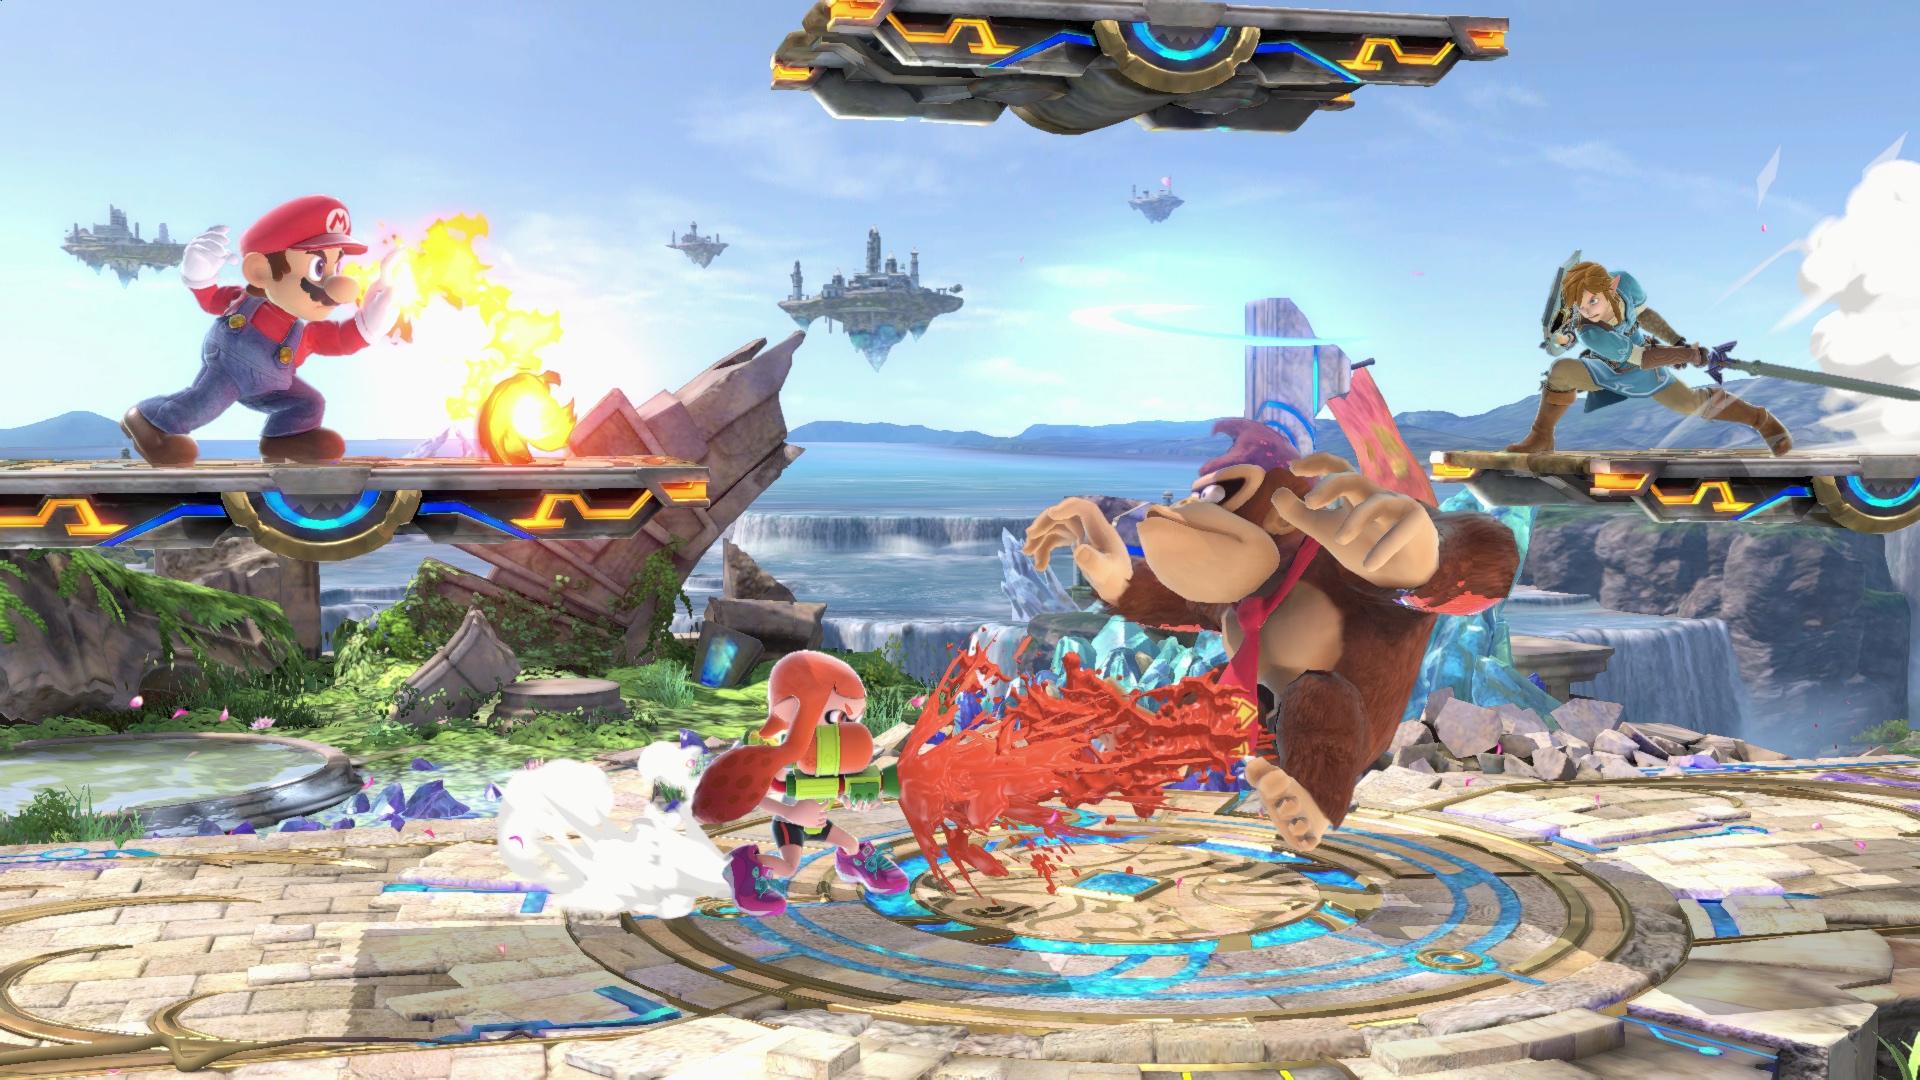 Super Smash Bros. Ultimate - match between Mario, Inkling Girl, Donkey Kong and Link